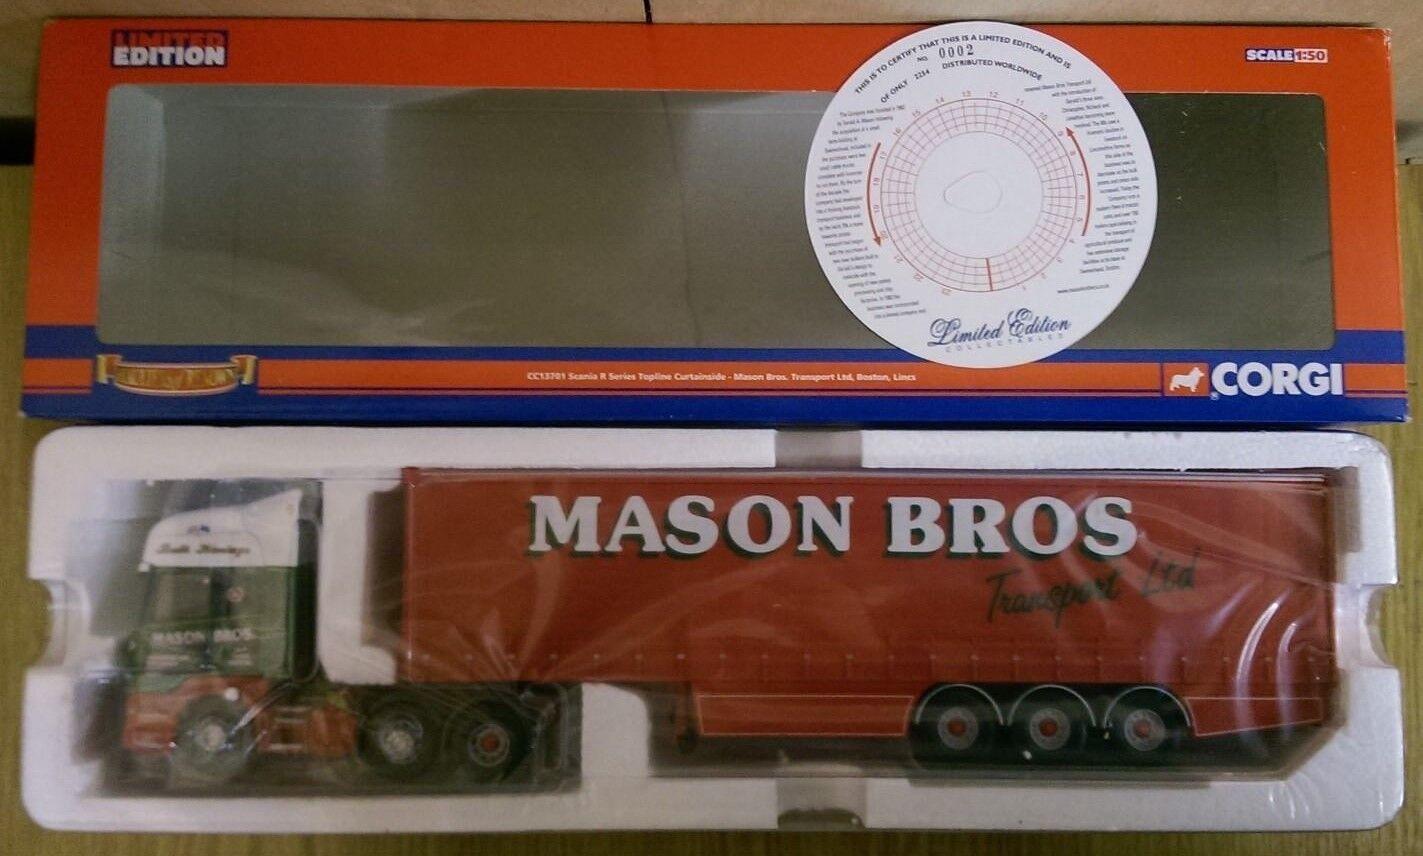 Corgi CC13701 Scania Serie R Topline Curtainside Mason Bros Ltd Ed 0002 de 2254